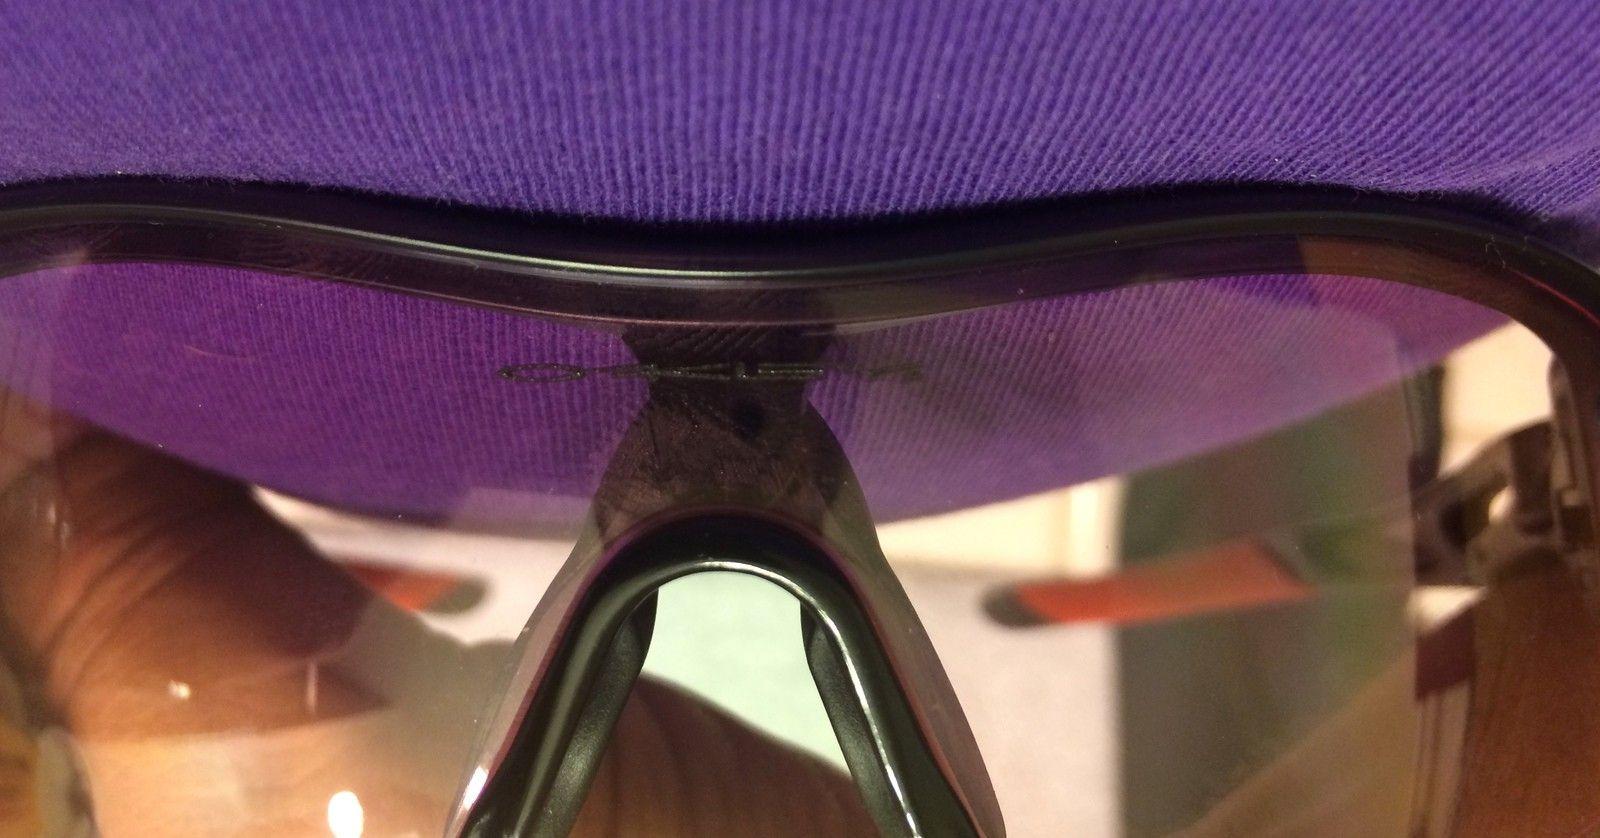 RadarLock - Matte Black Ink w/choice of Lenses - $89 - 2015-09-13 22.02.05.jpg